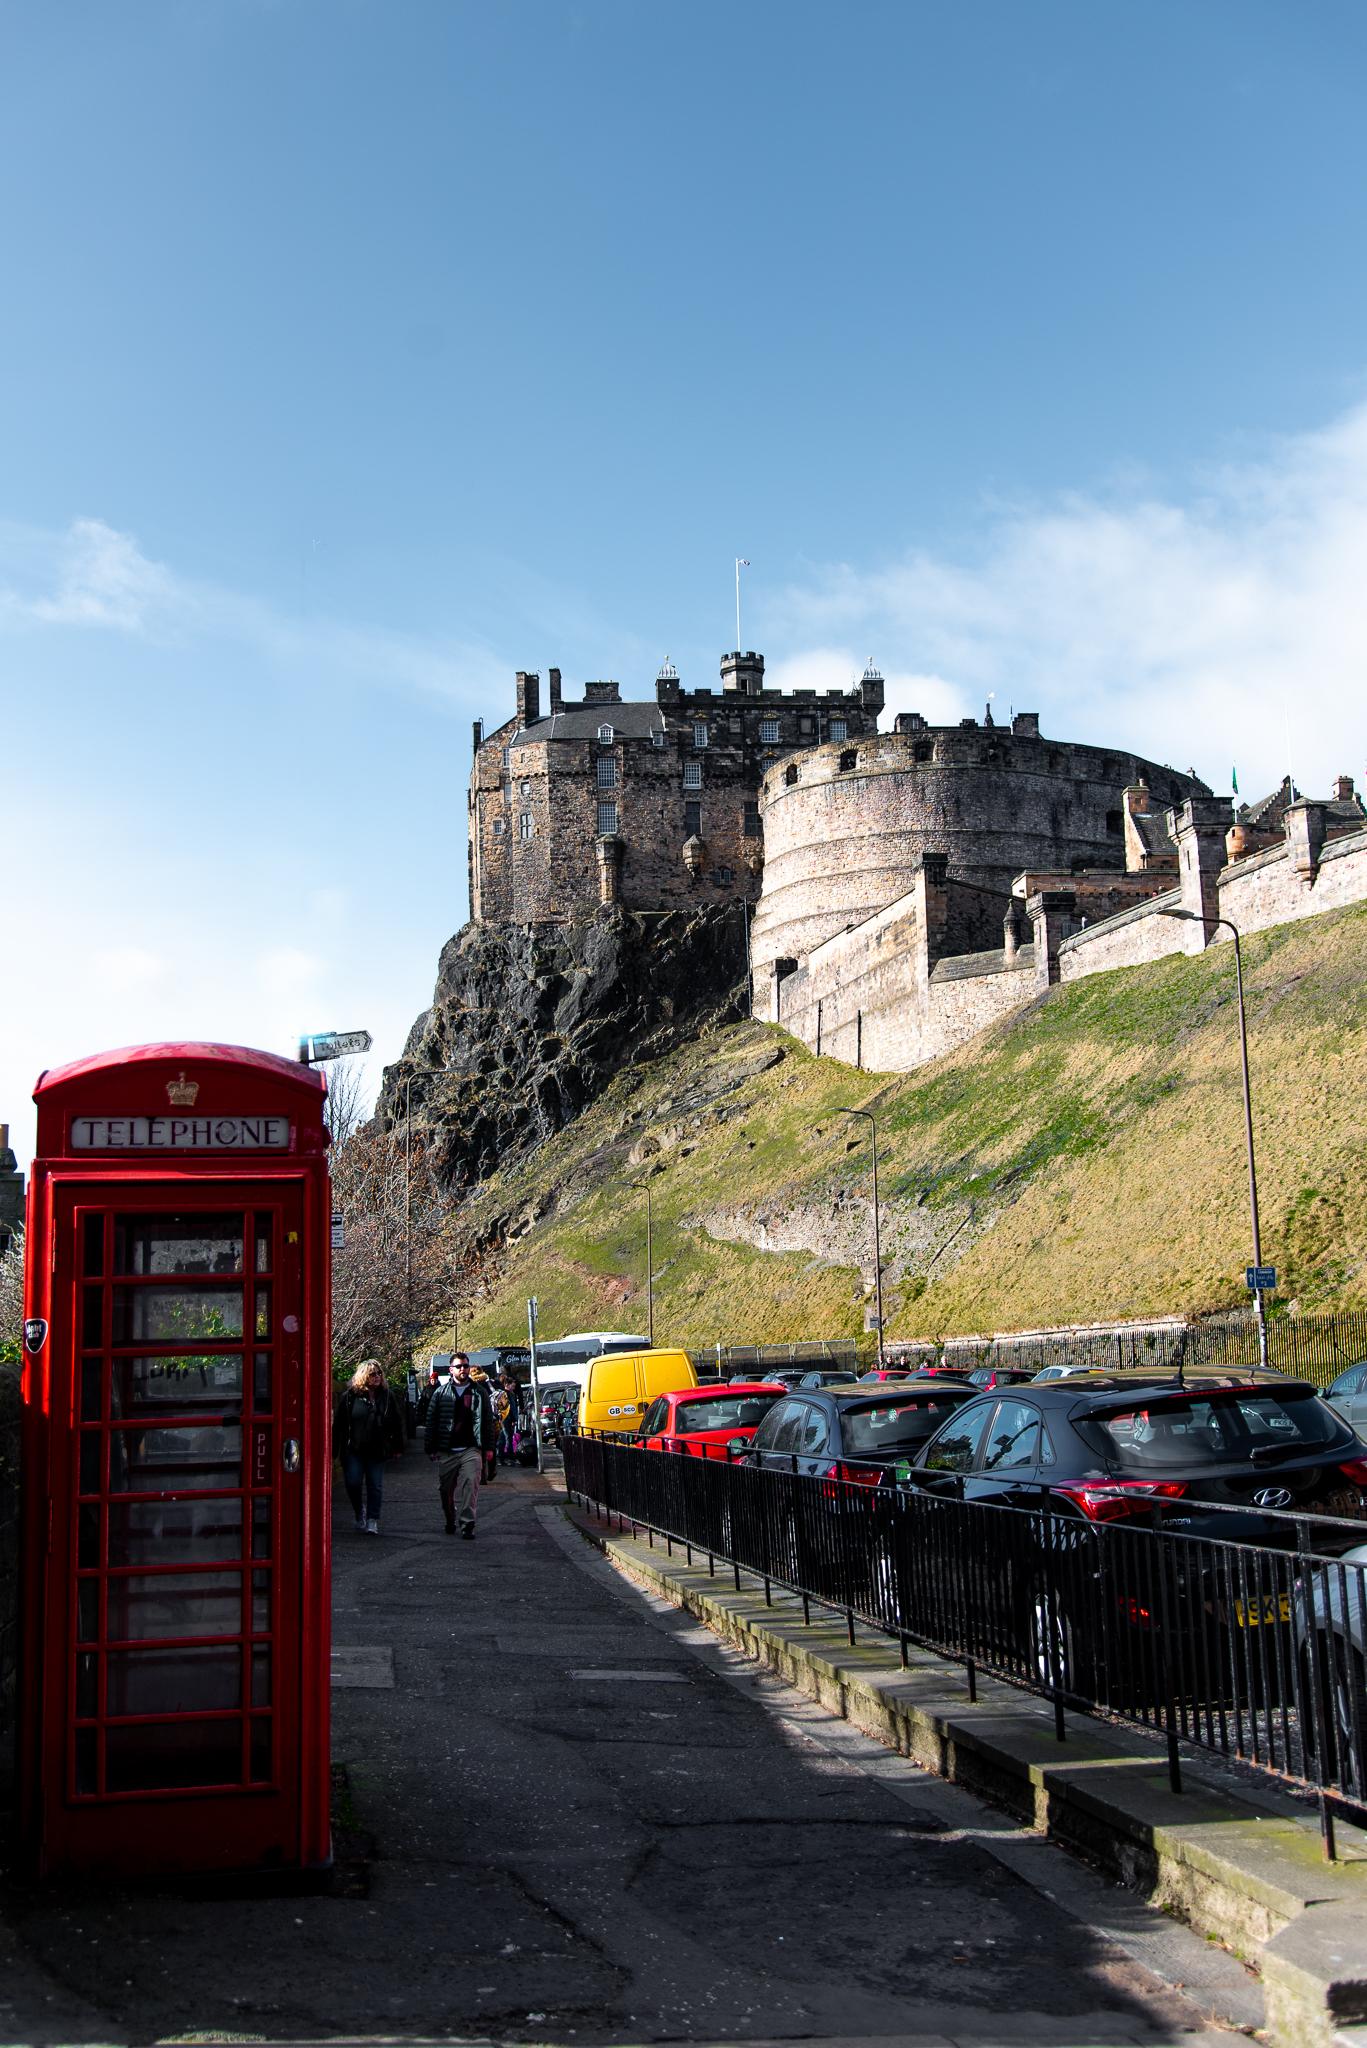 scotland, edinburgh, castle, phone box, uk, scotland